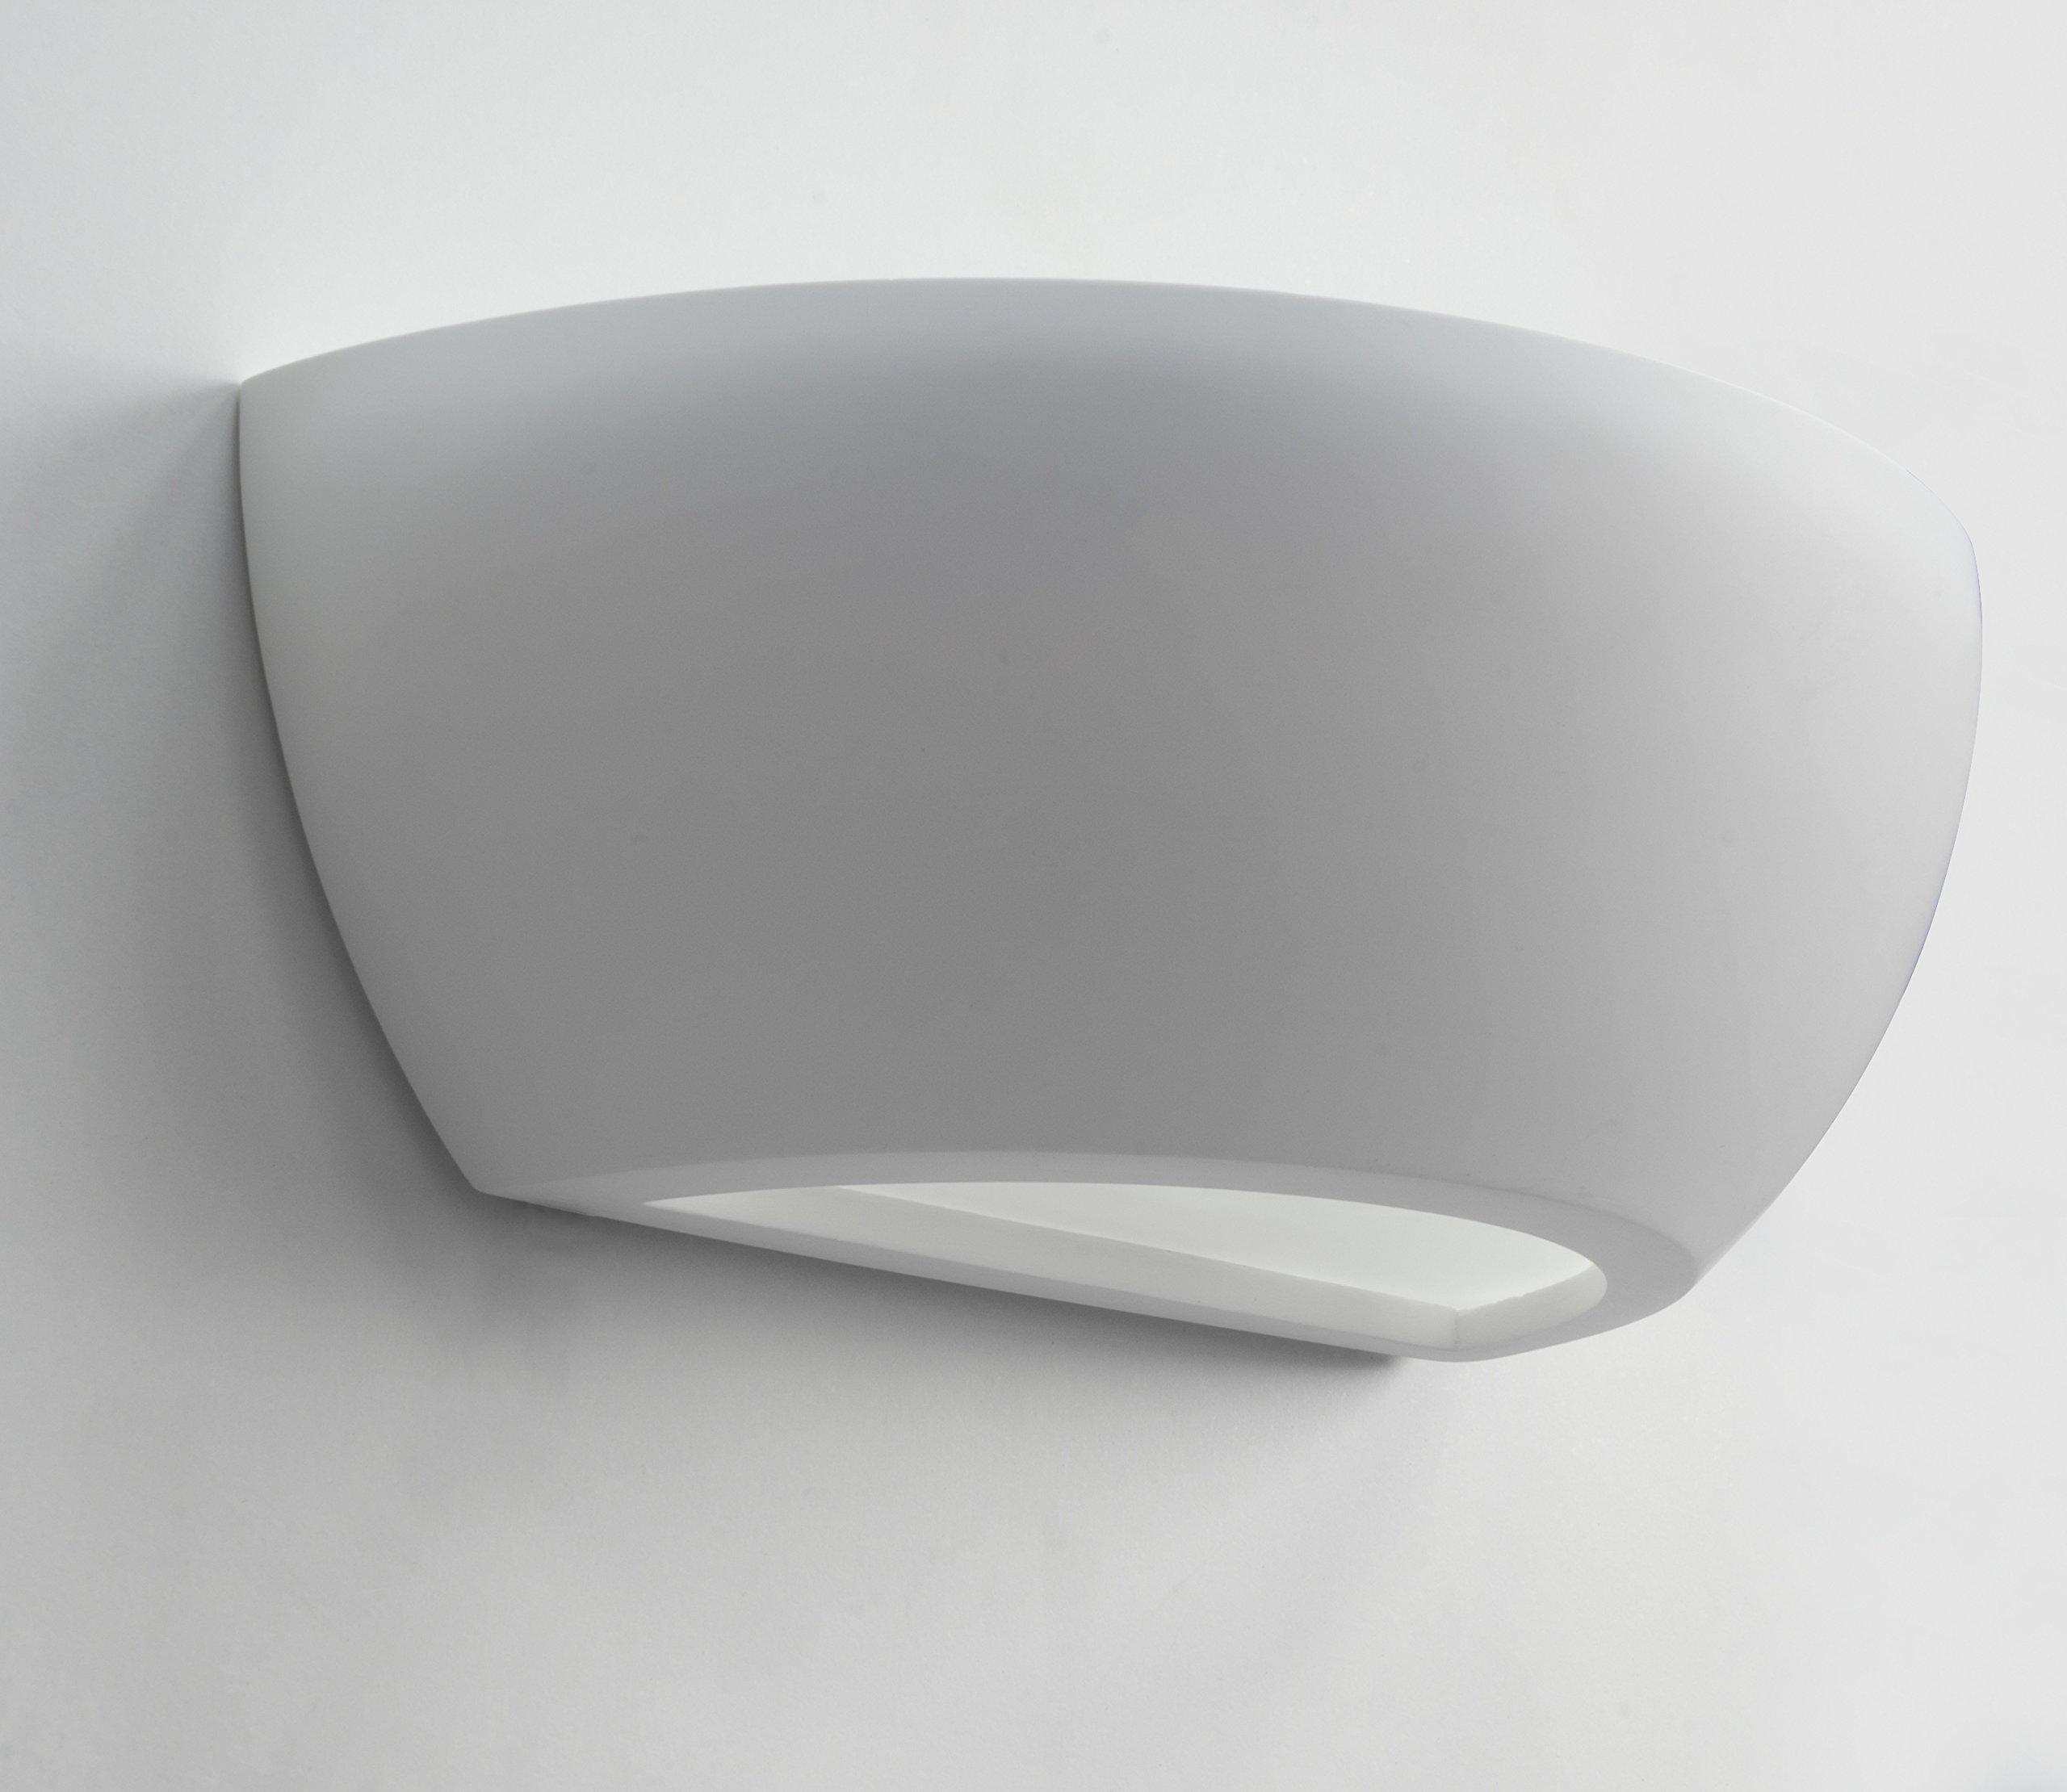 Modern Semi Circular Indoor White Ceramic Wall Light Fixture M25